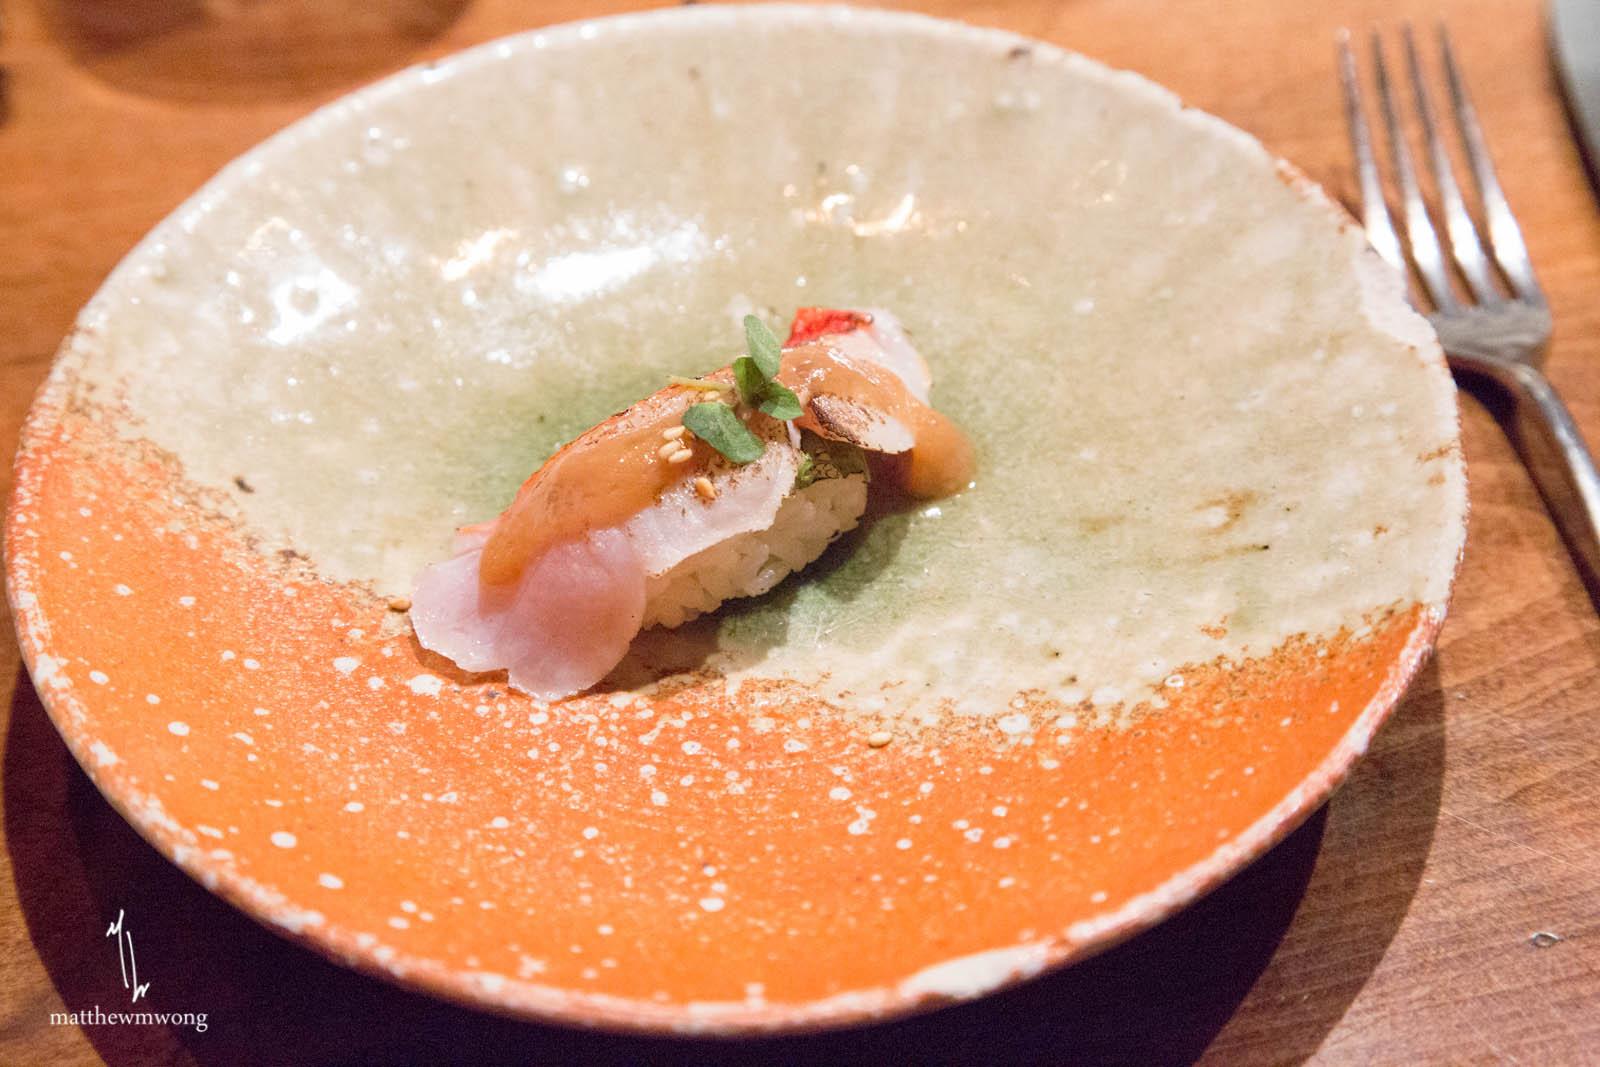 Kin Medai - ume, japanese plum vinaigrette, shiso